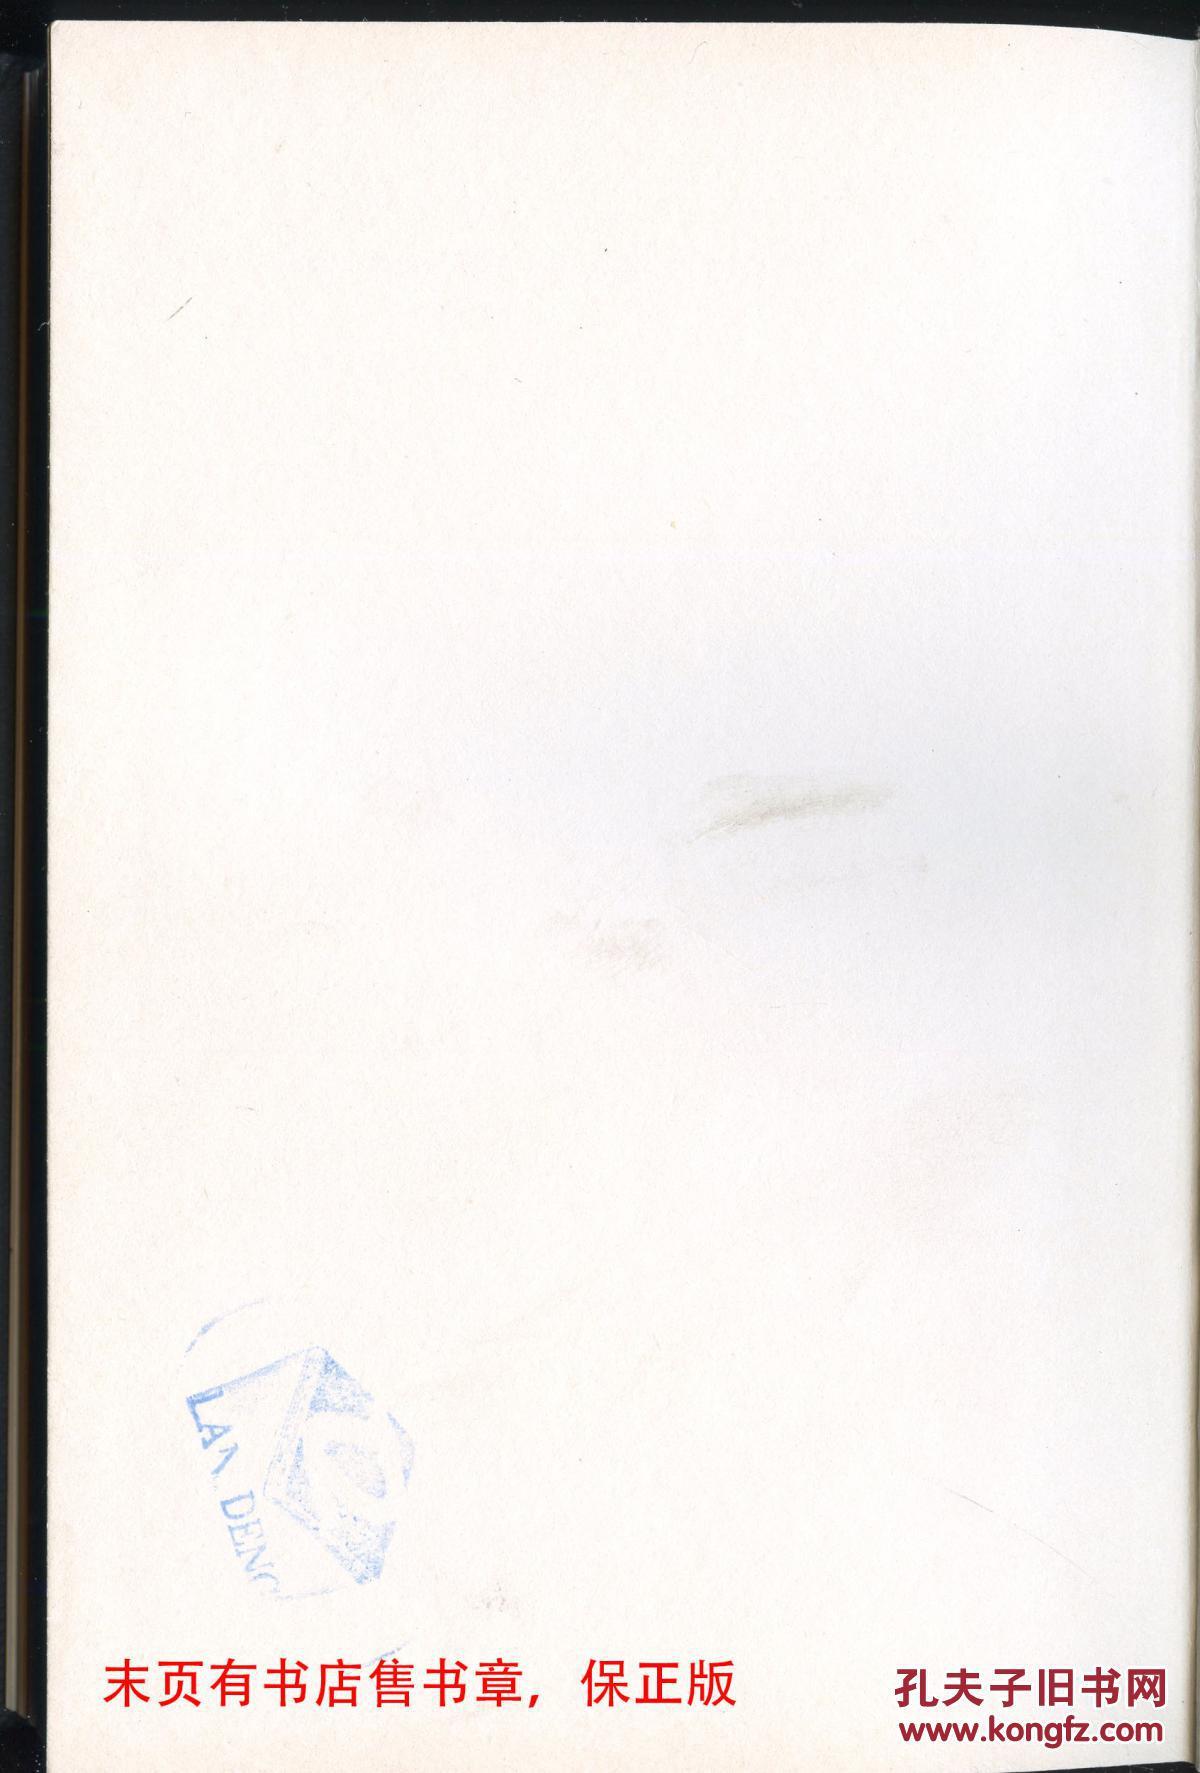 ppt 背景 背景图片 边框 模板 设计 相框 1200_1773 竖版 竖屏